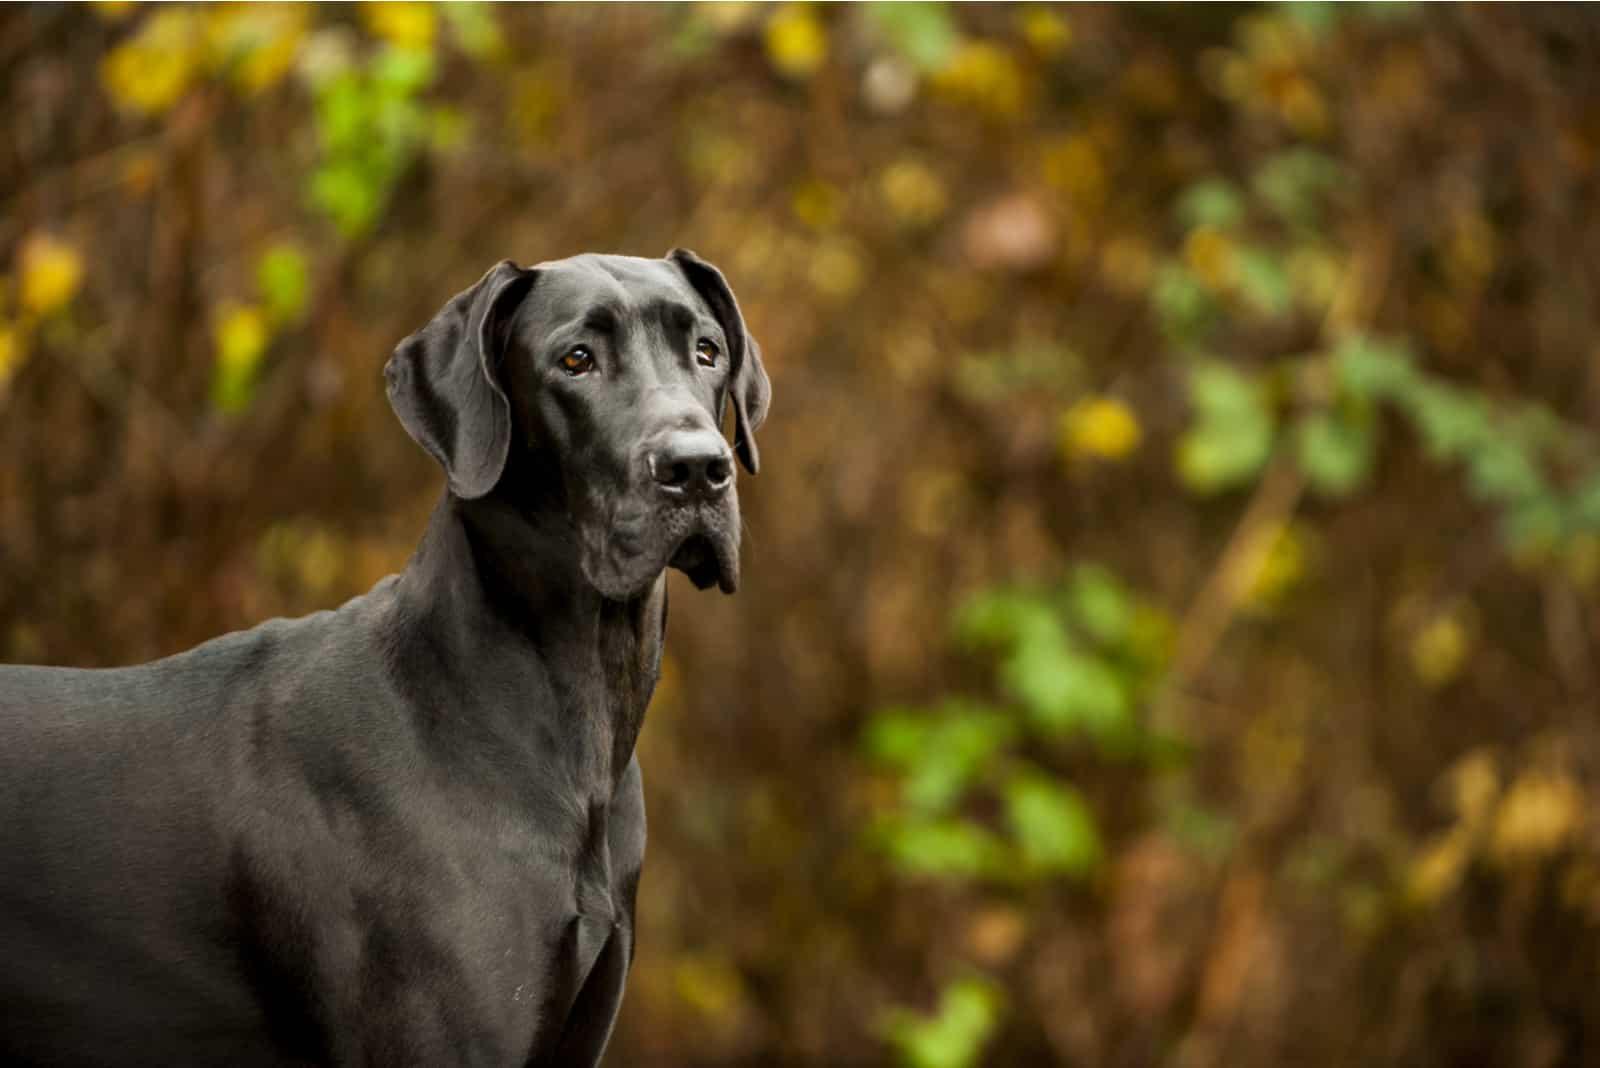 Great Dane standing in front of vegetation